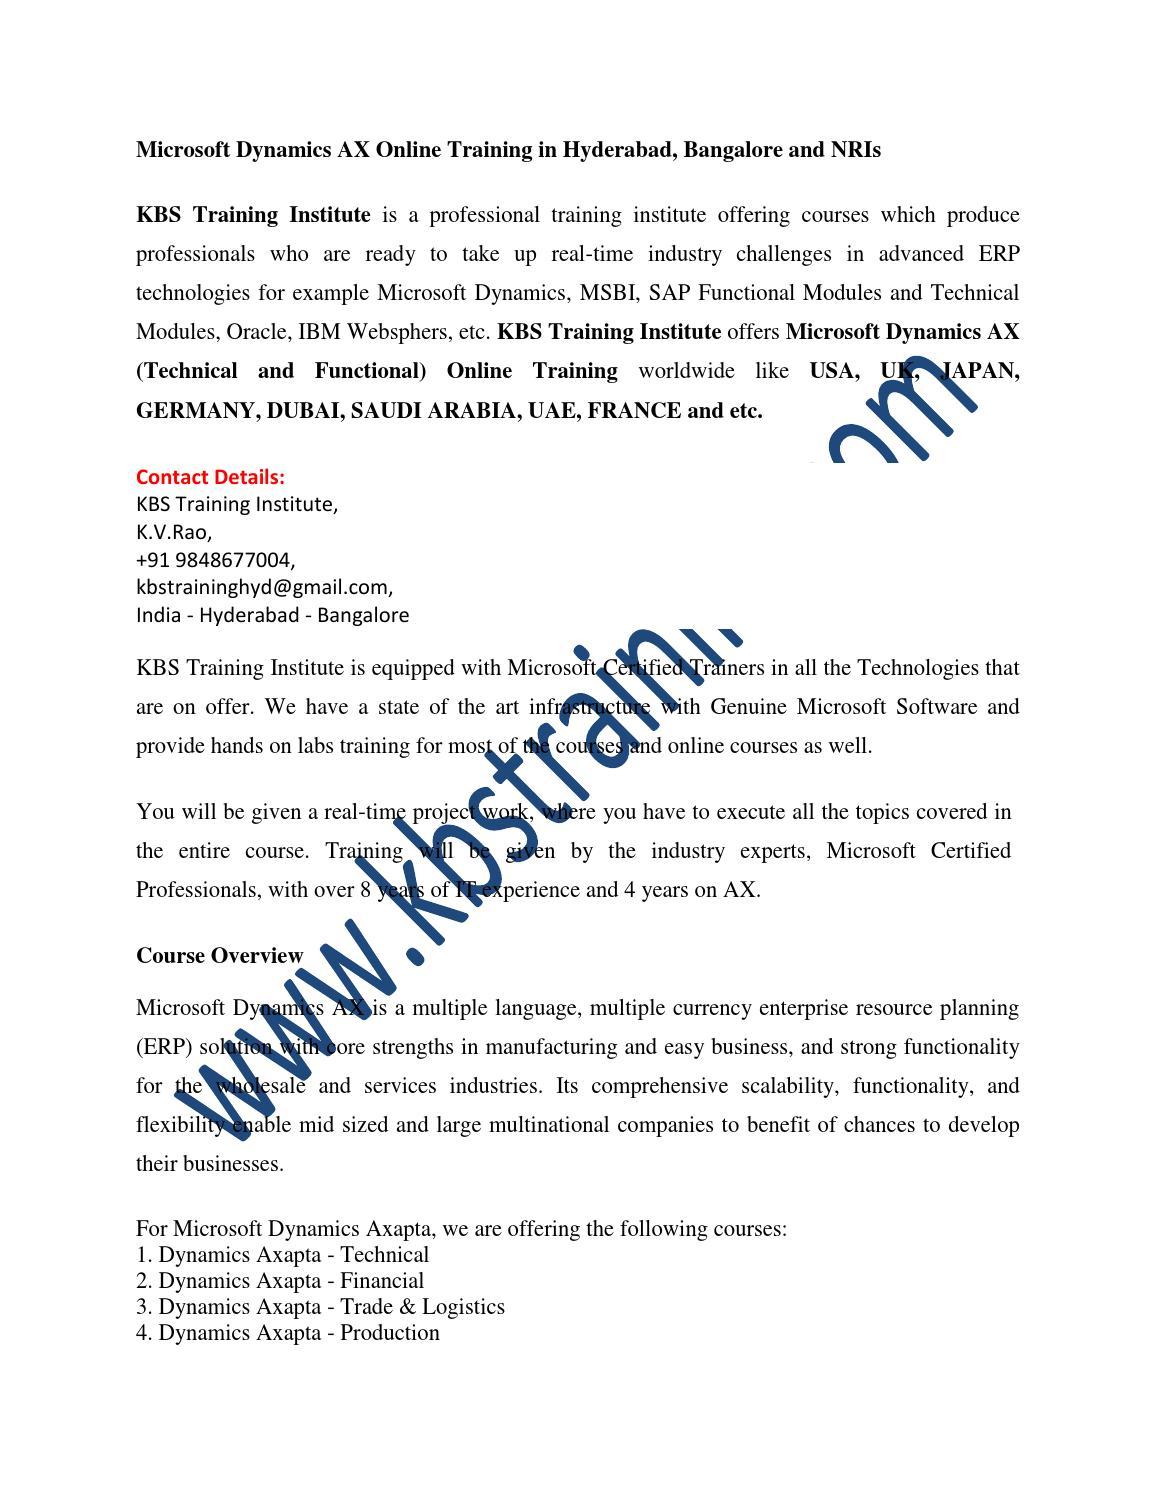 Microsoft Dynamics Ax Axapta Online Training And Corporate